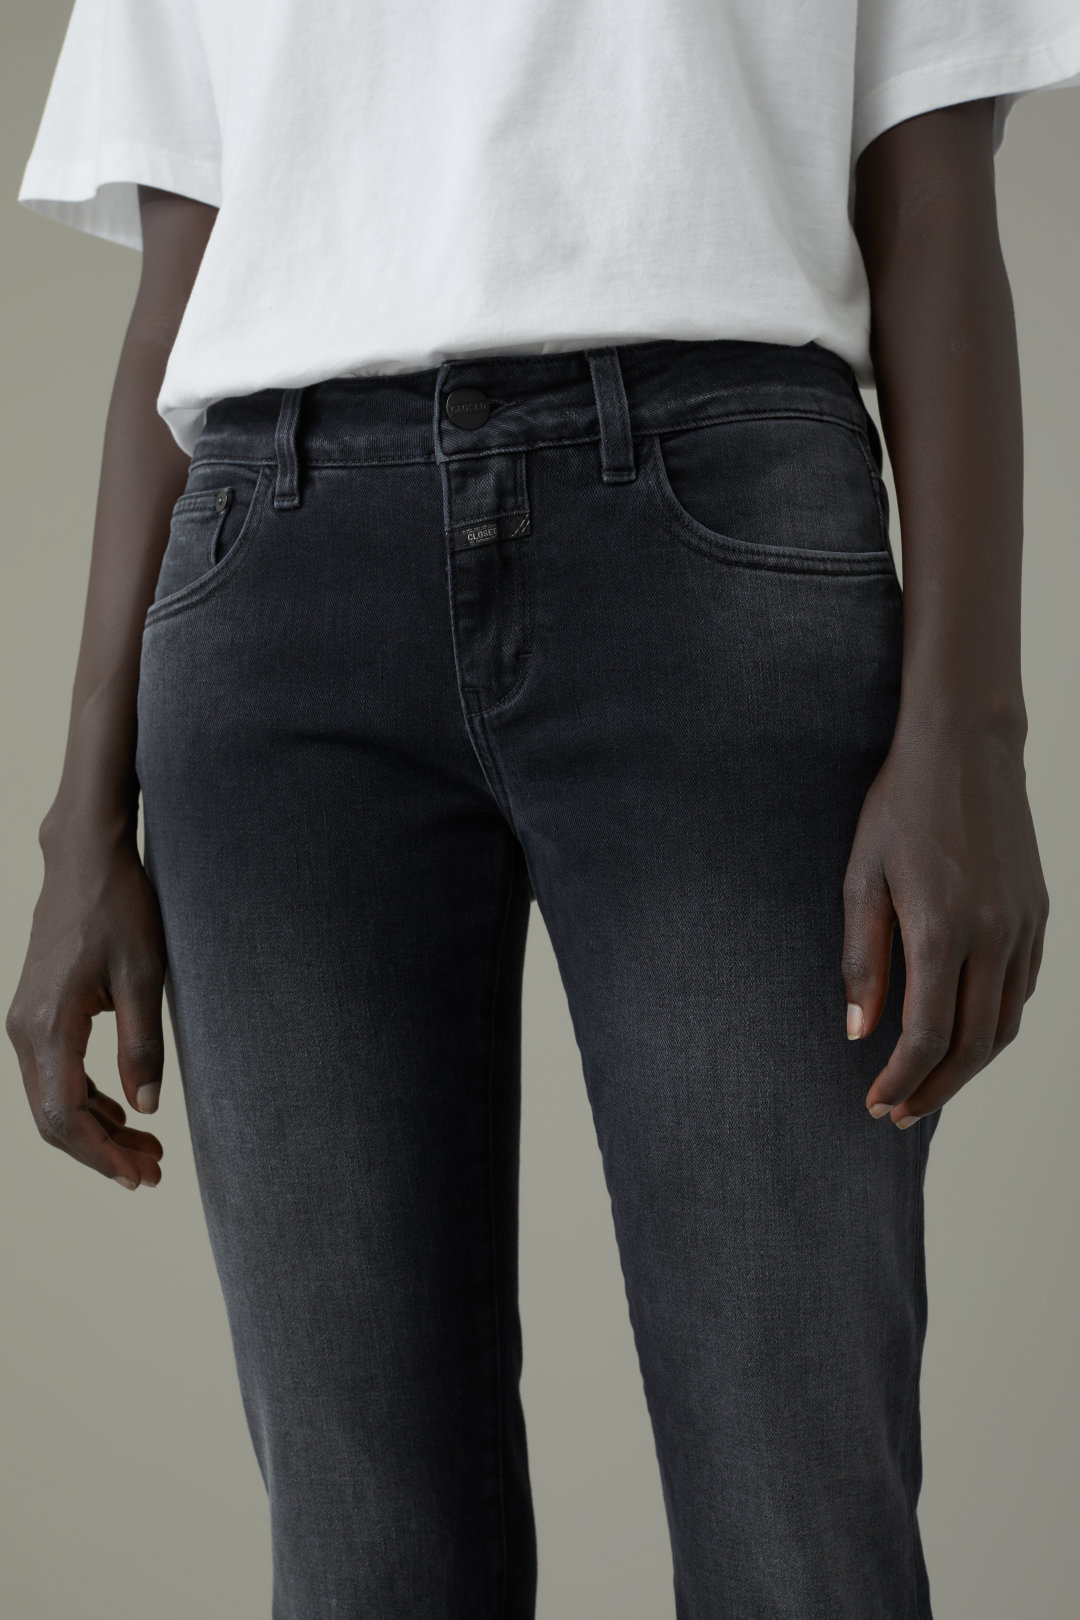 Closed Jeans C91833 03Z 3E-3